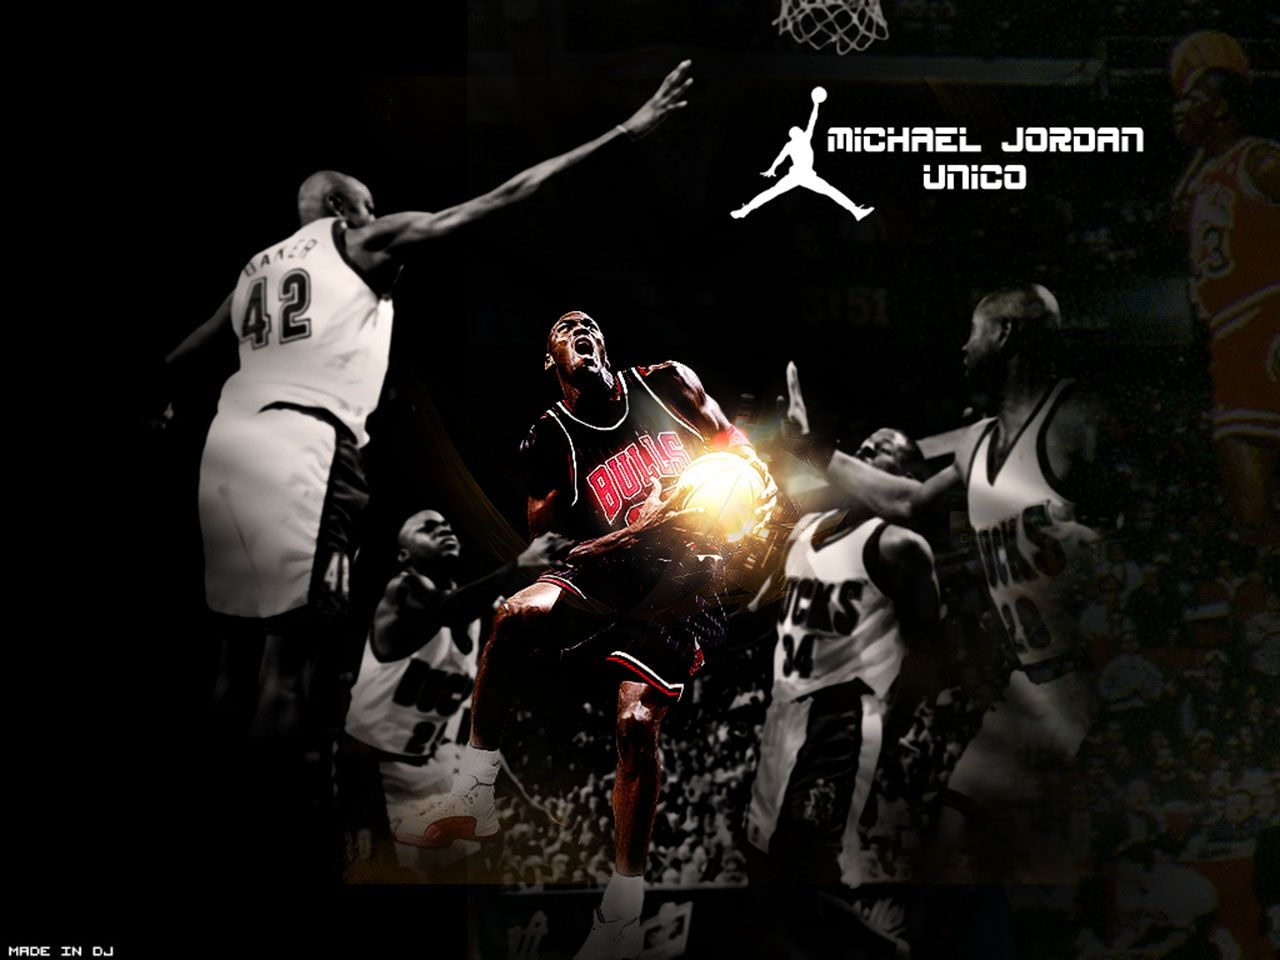 Beautiful Wallpaper Logo Michael Jordan - c5c976575a0ab60789c0a0adad6a58c5  Gallery_671939.jpg